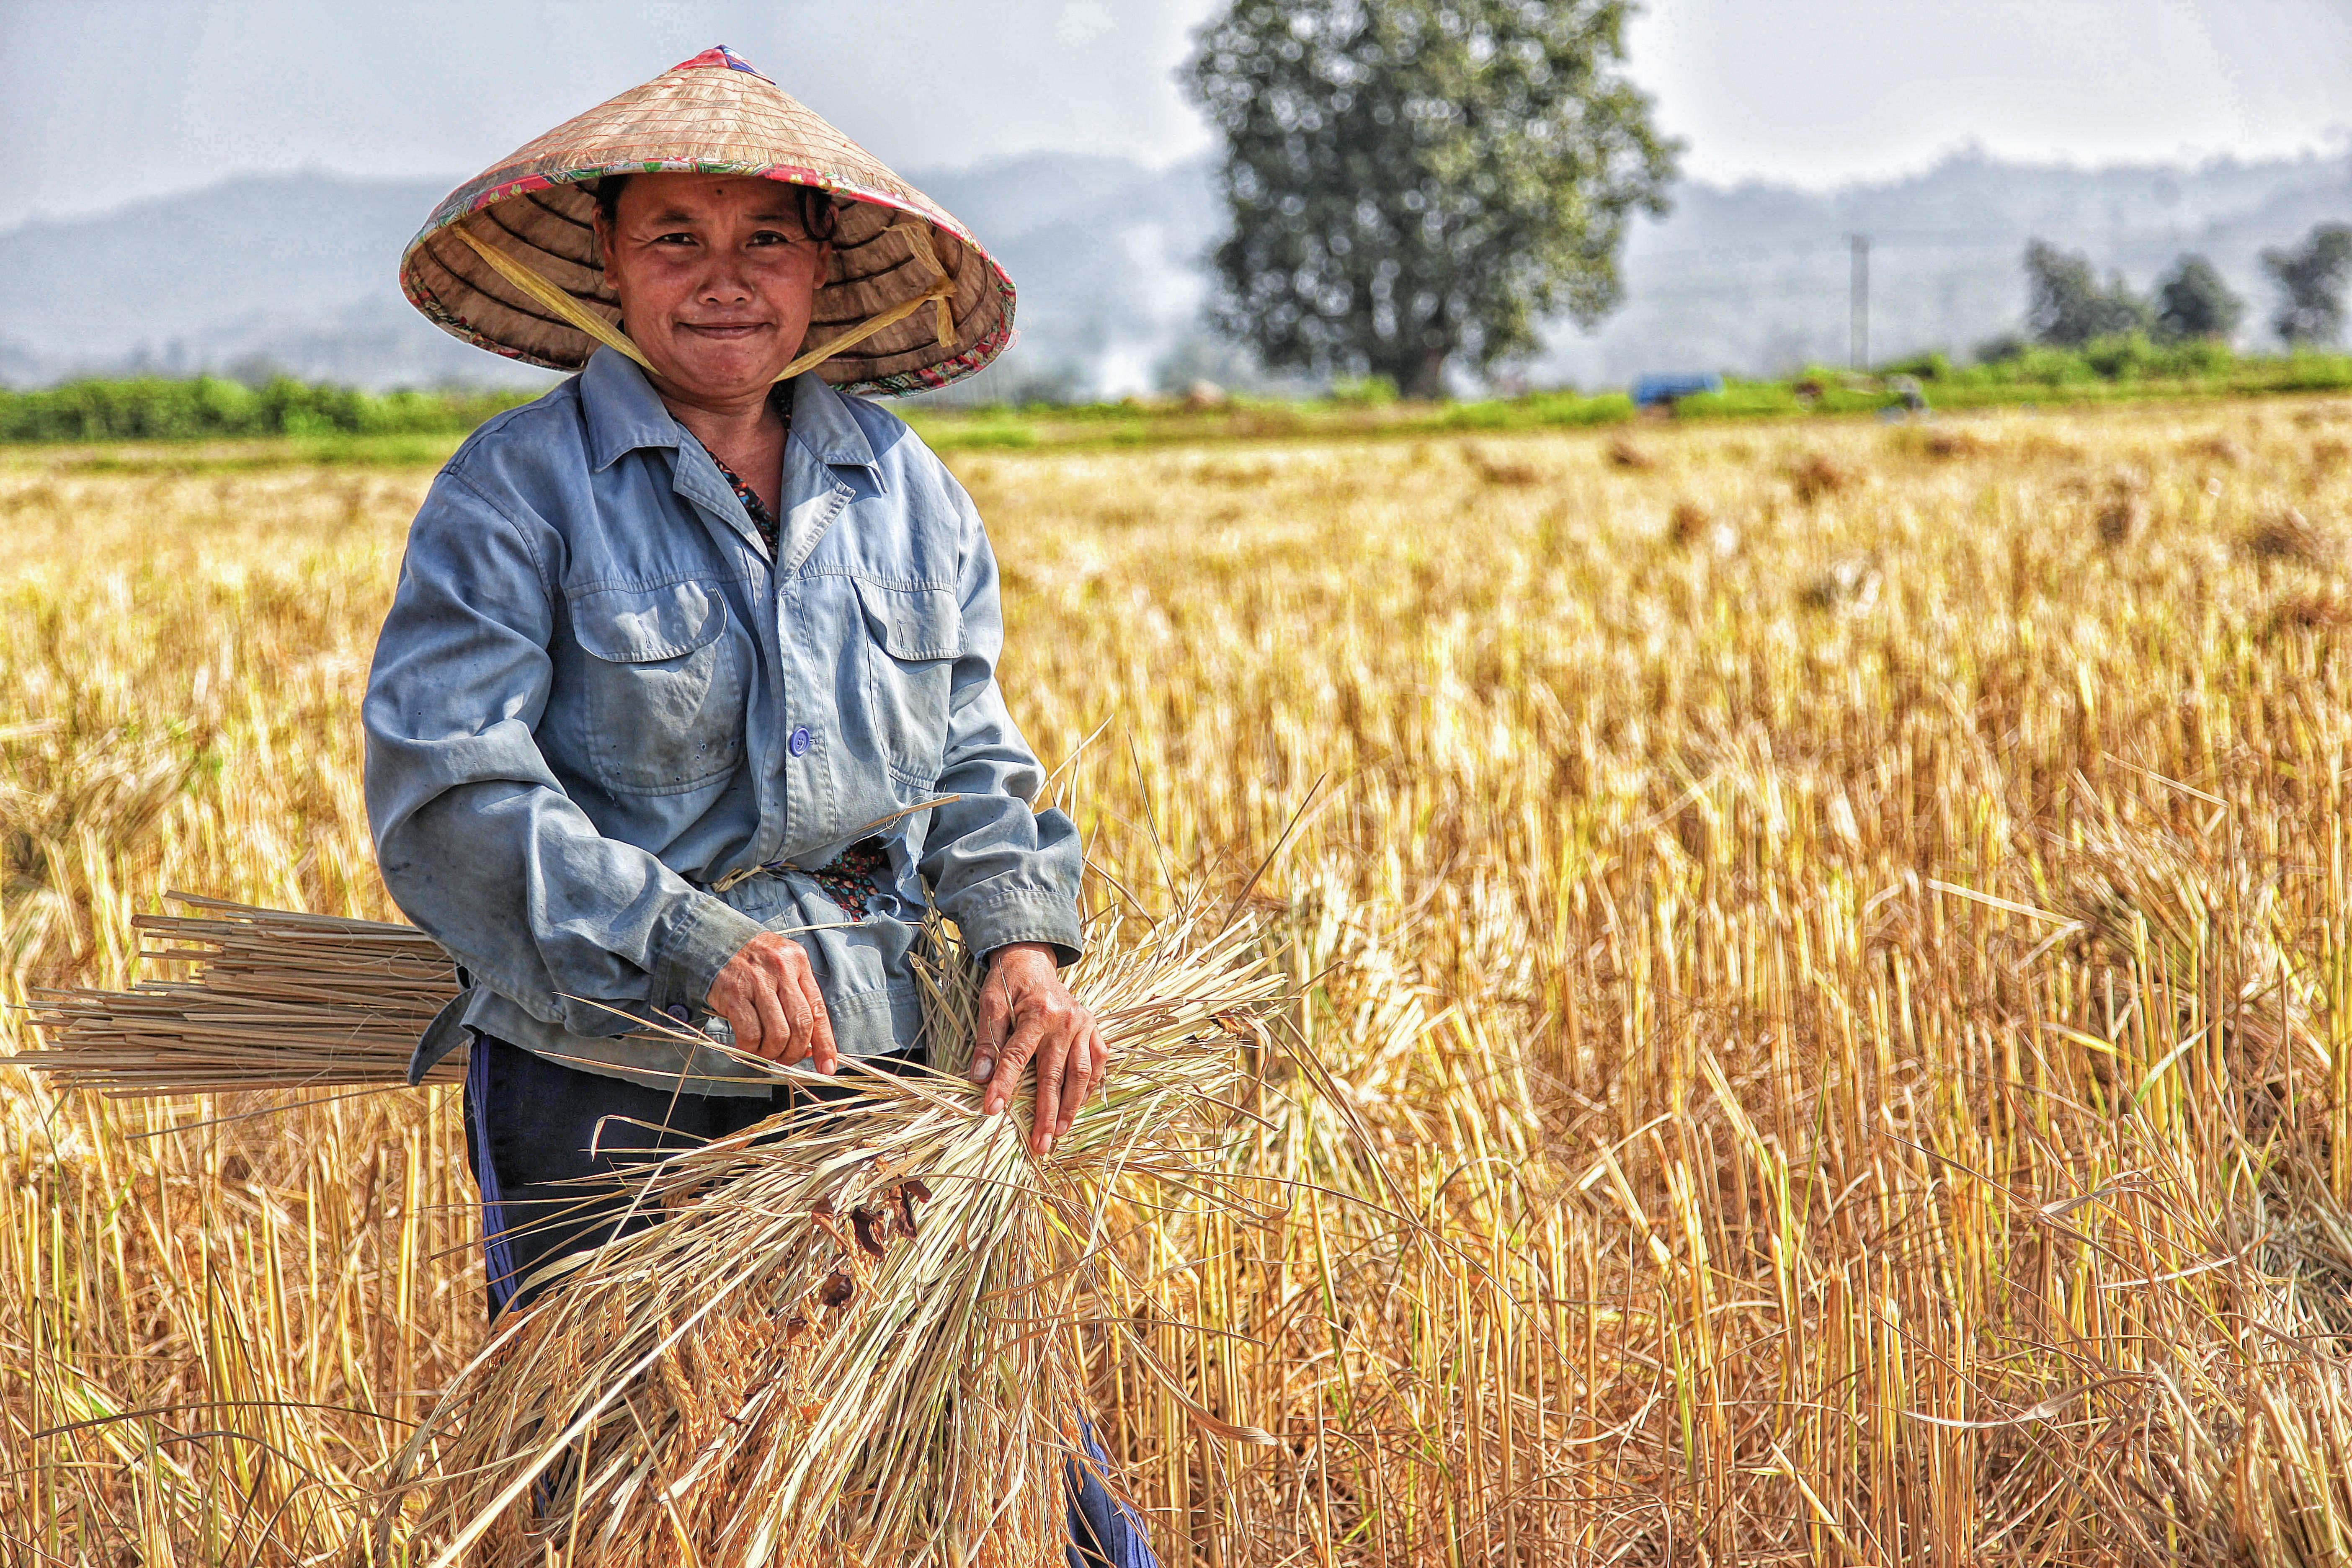 Chinese man in field bundles wheat